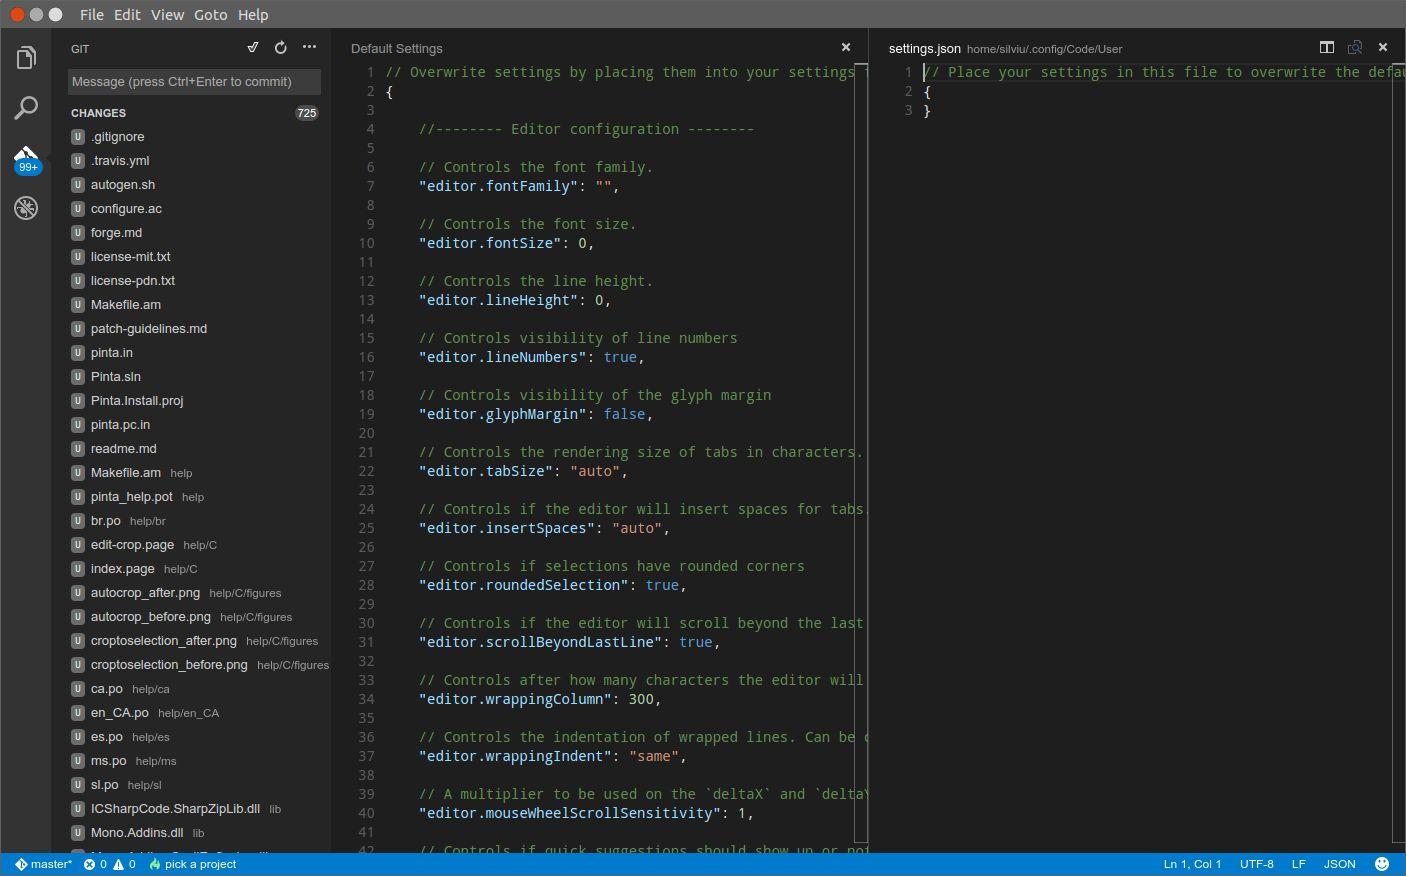 microsoft-visual-studio-code_3_174191.jpg